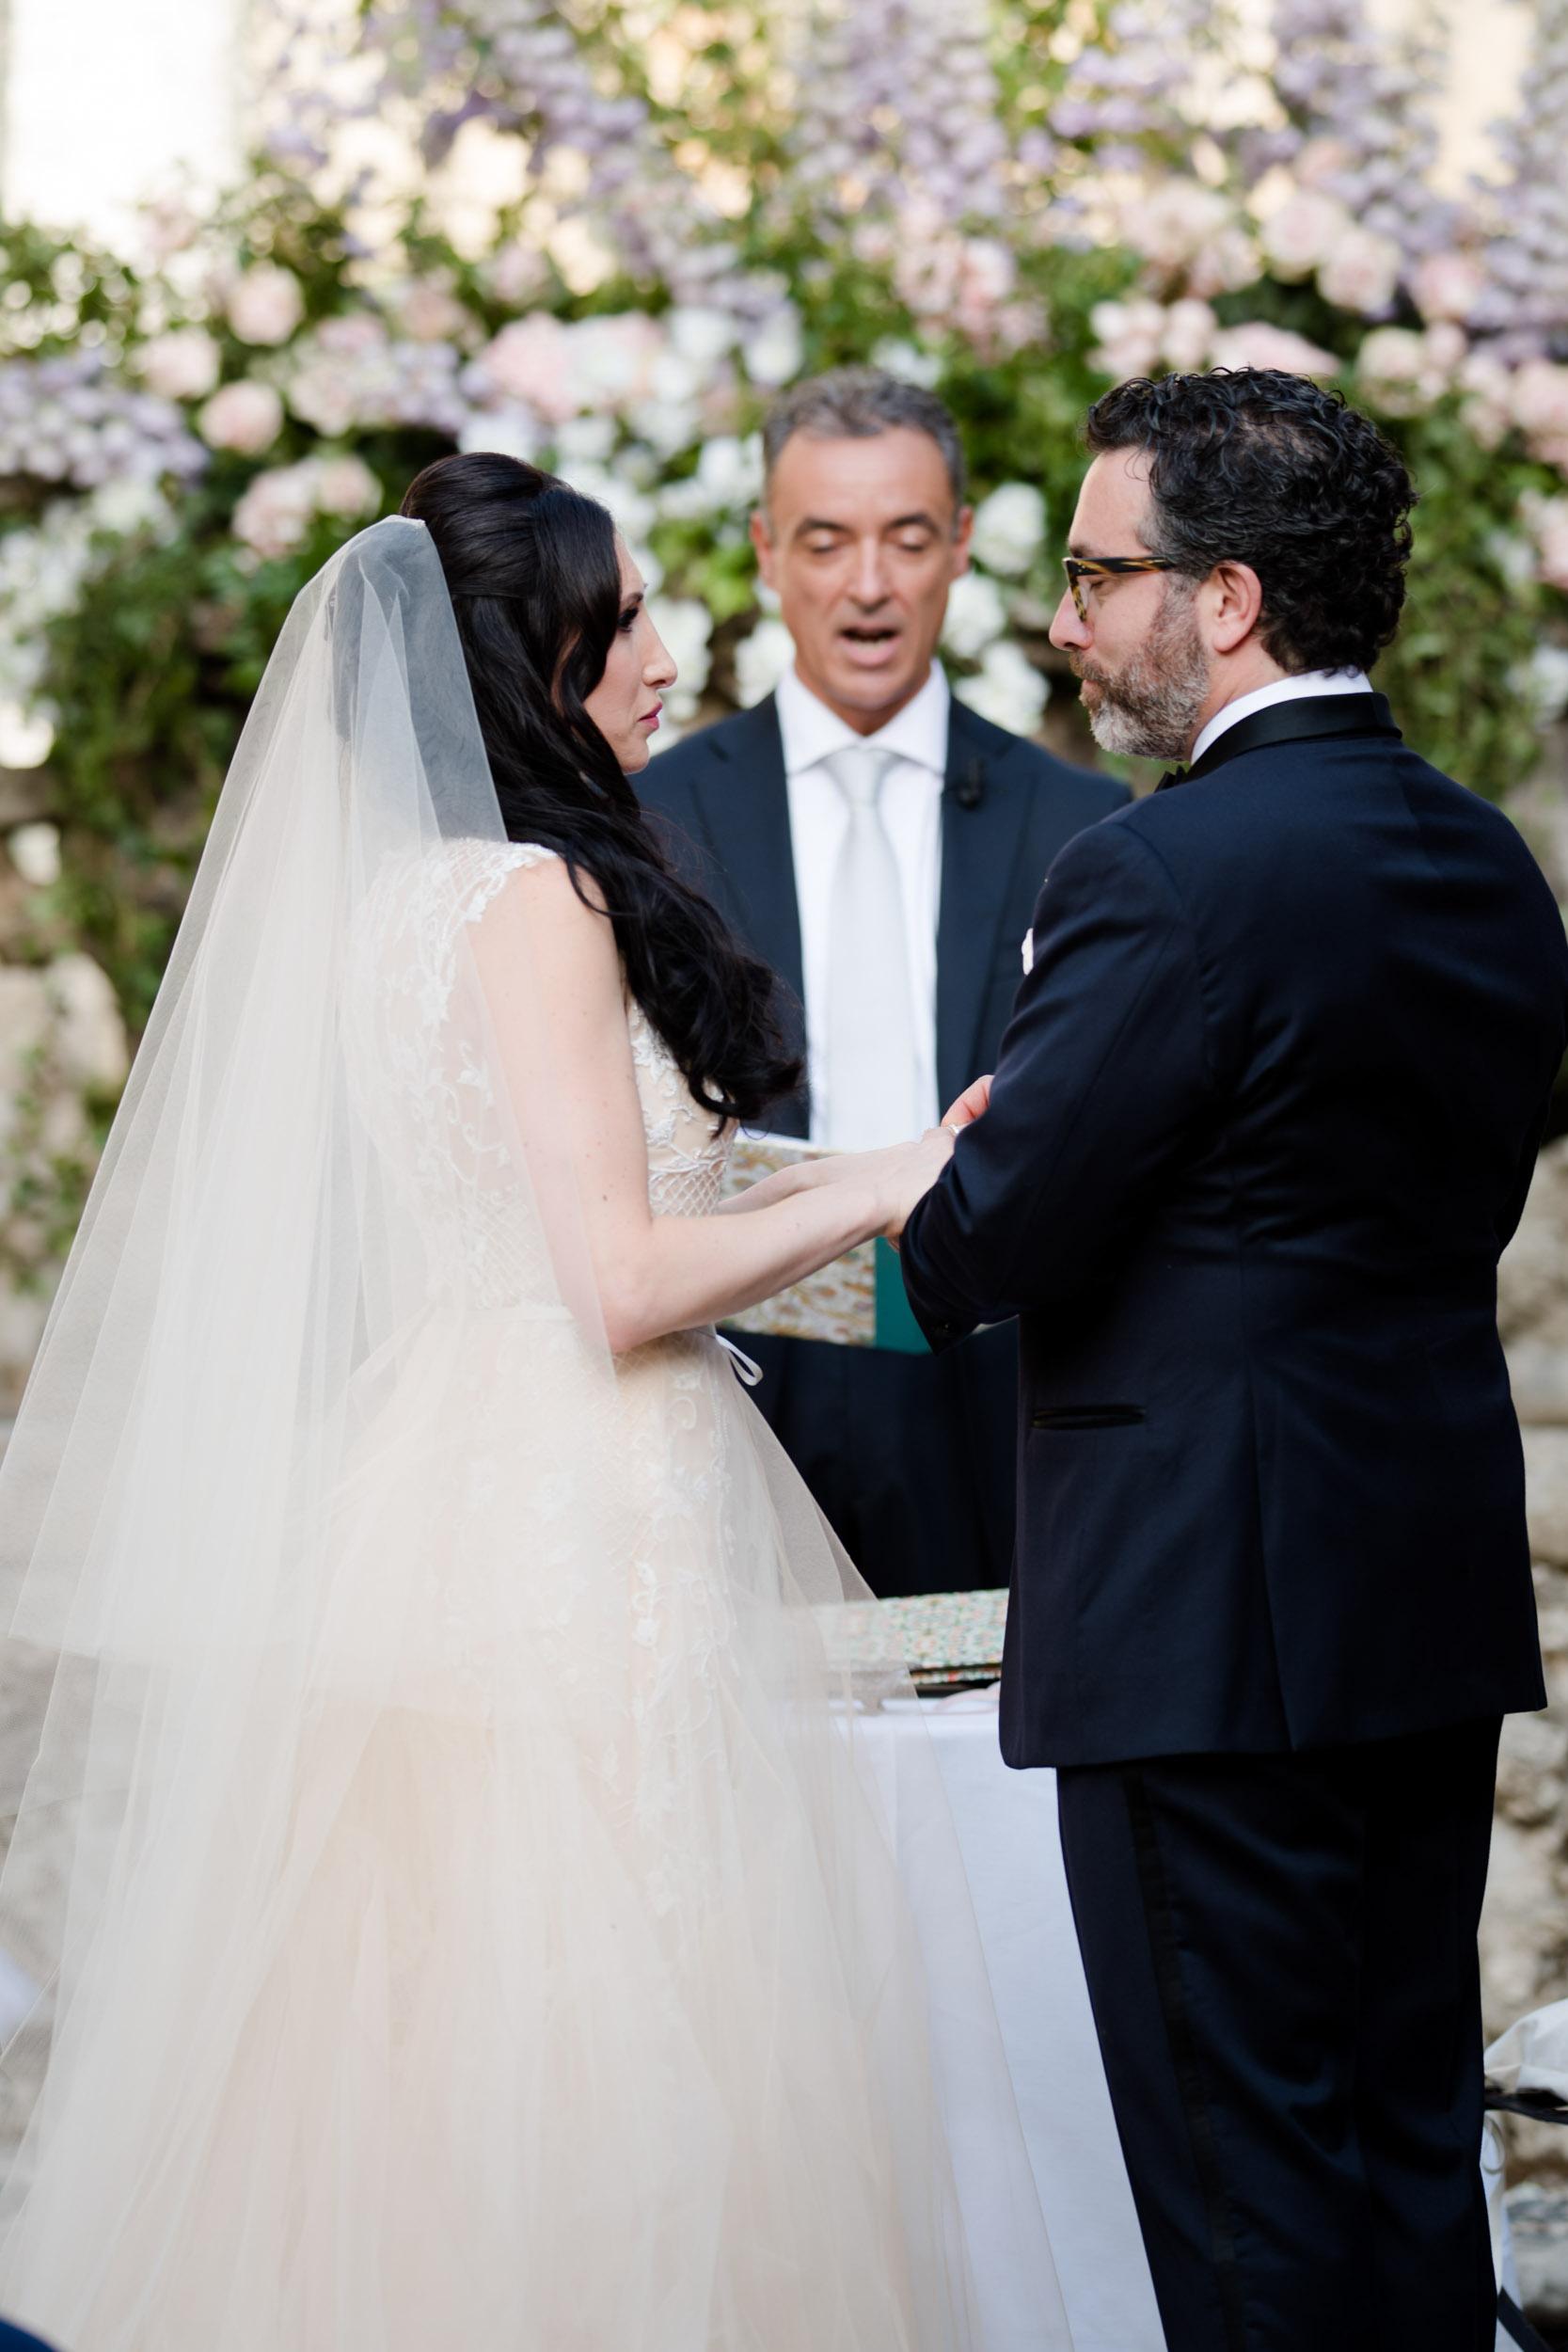 villa-gamberaia-florence-italy-destination-wedding-47.jpg